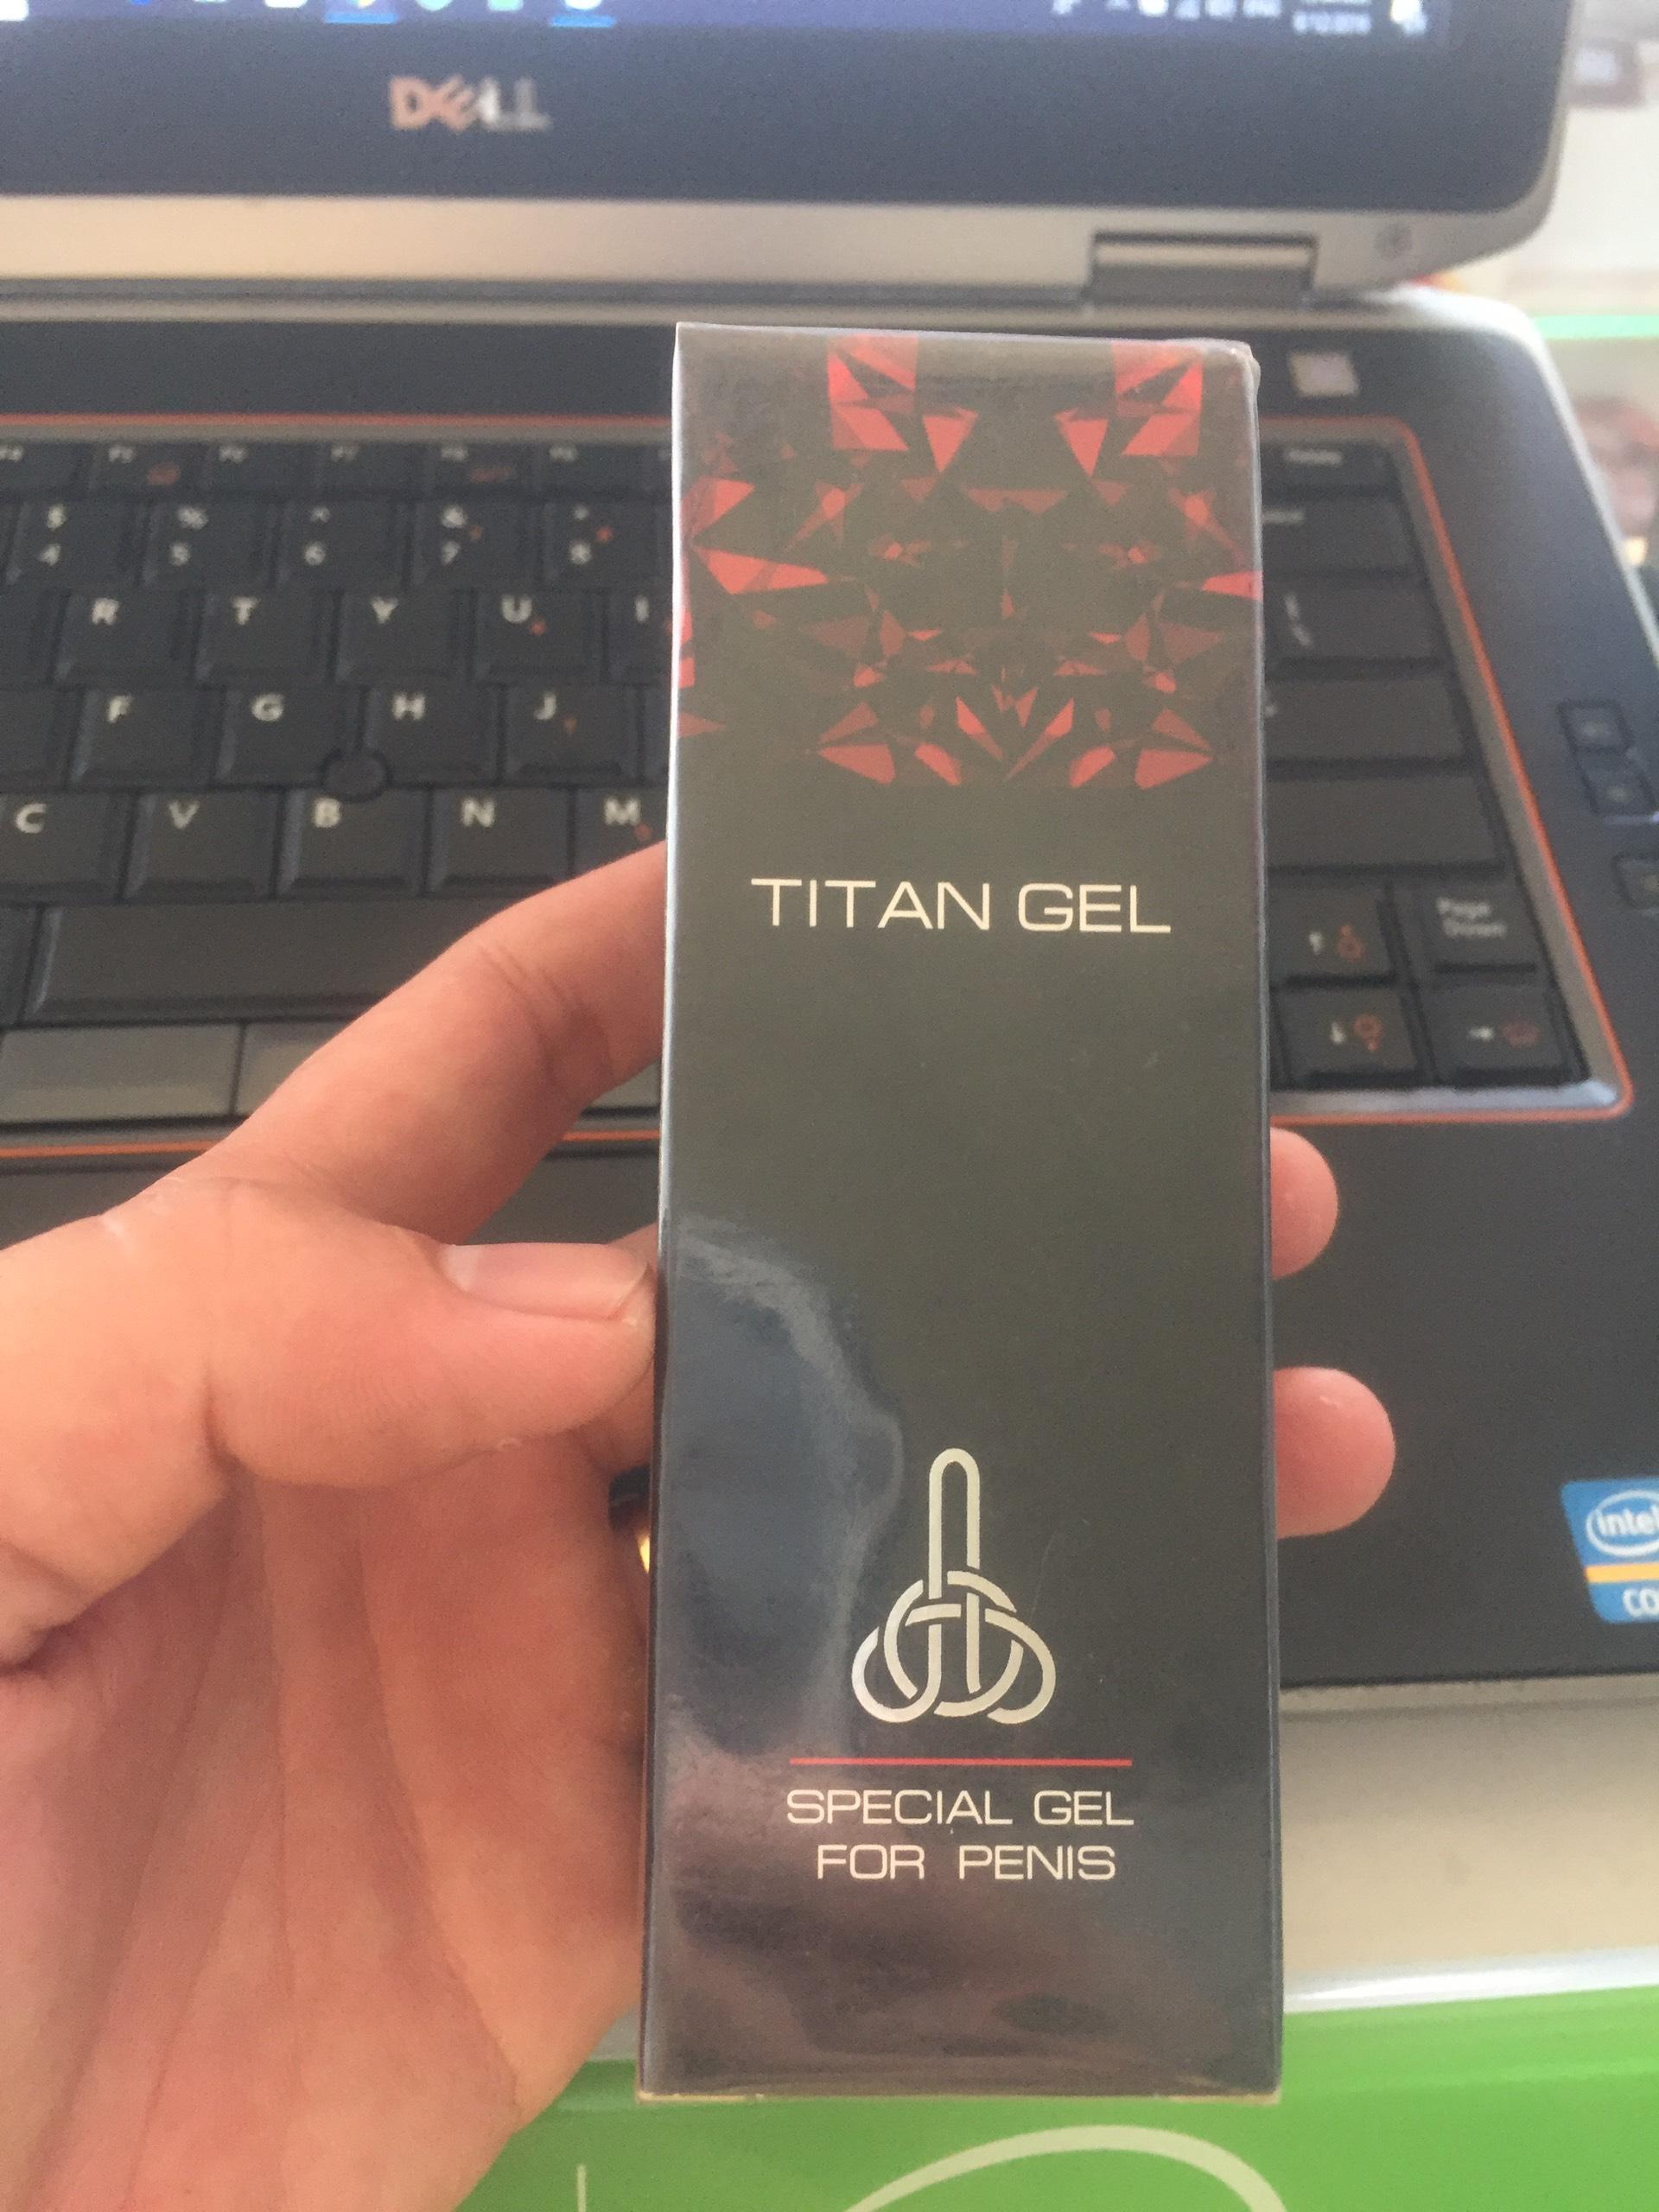 Dầu titan geI